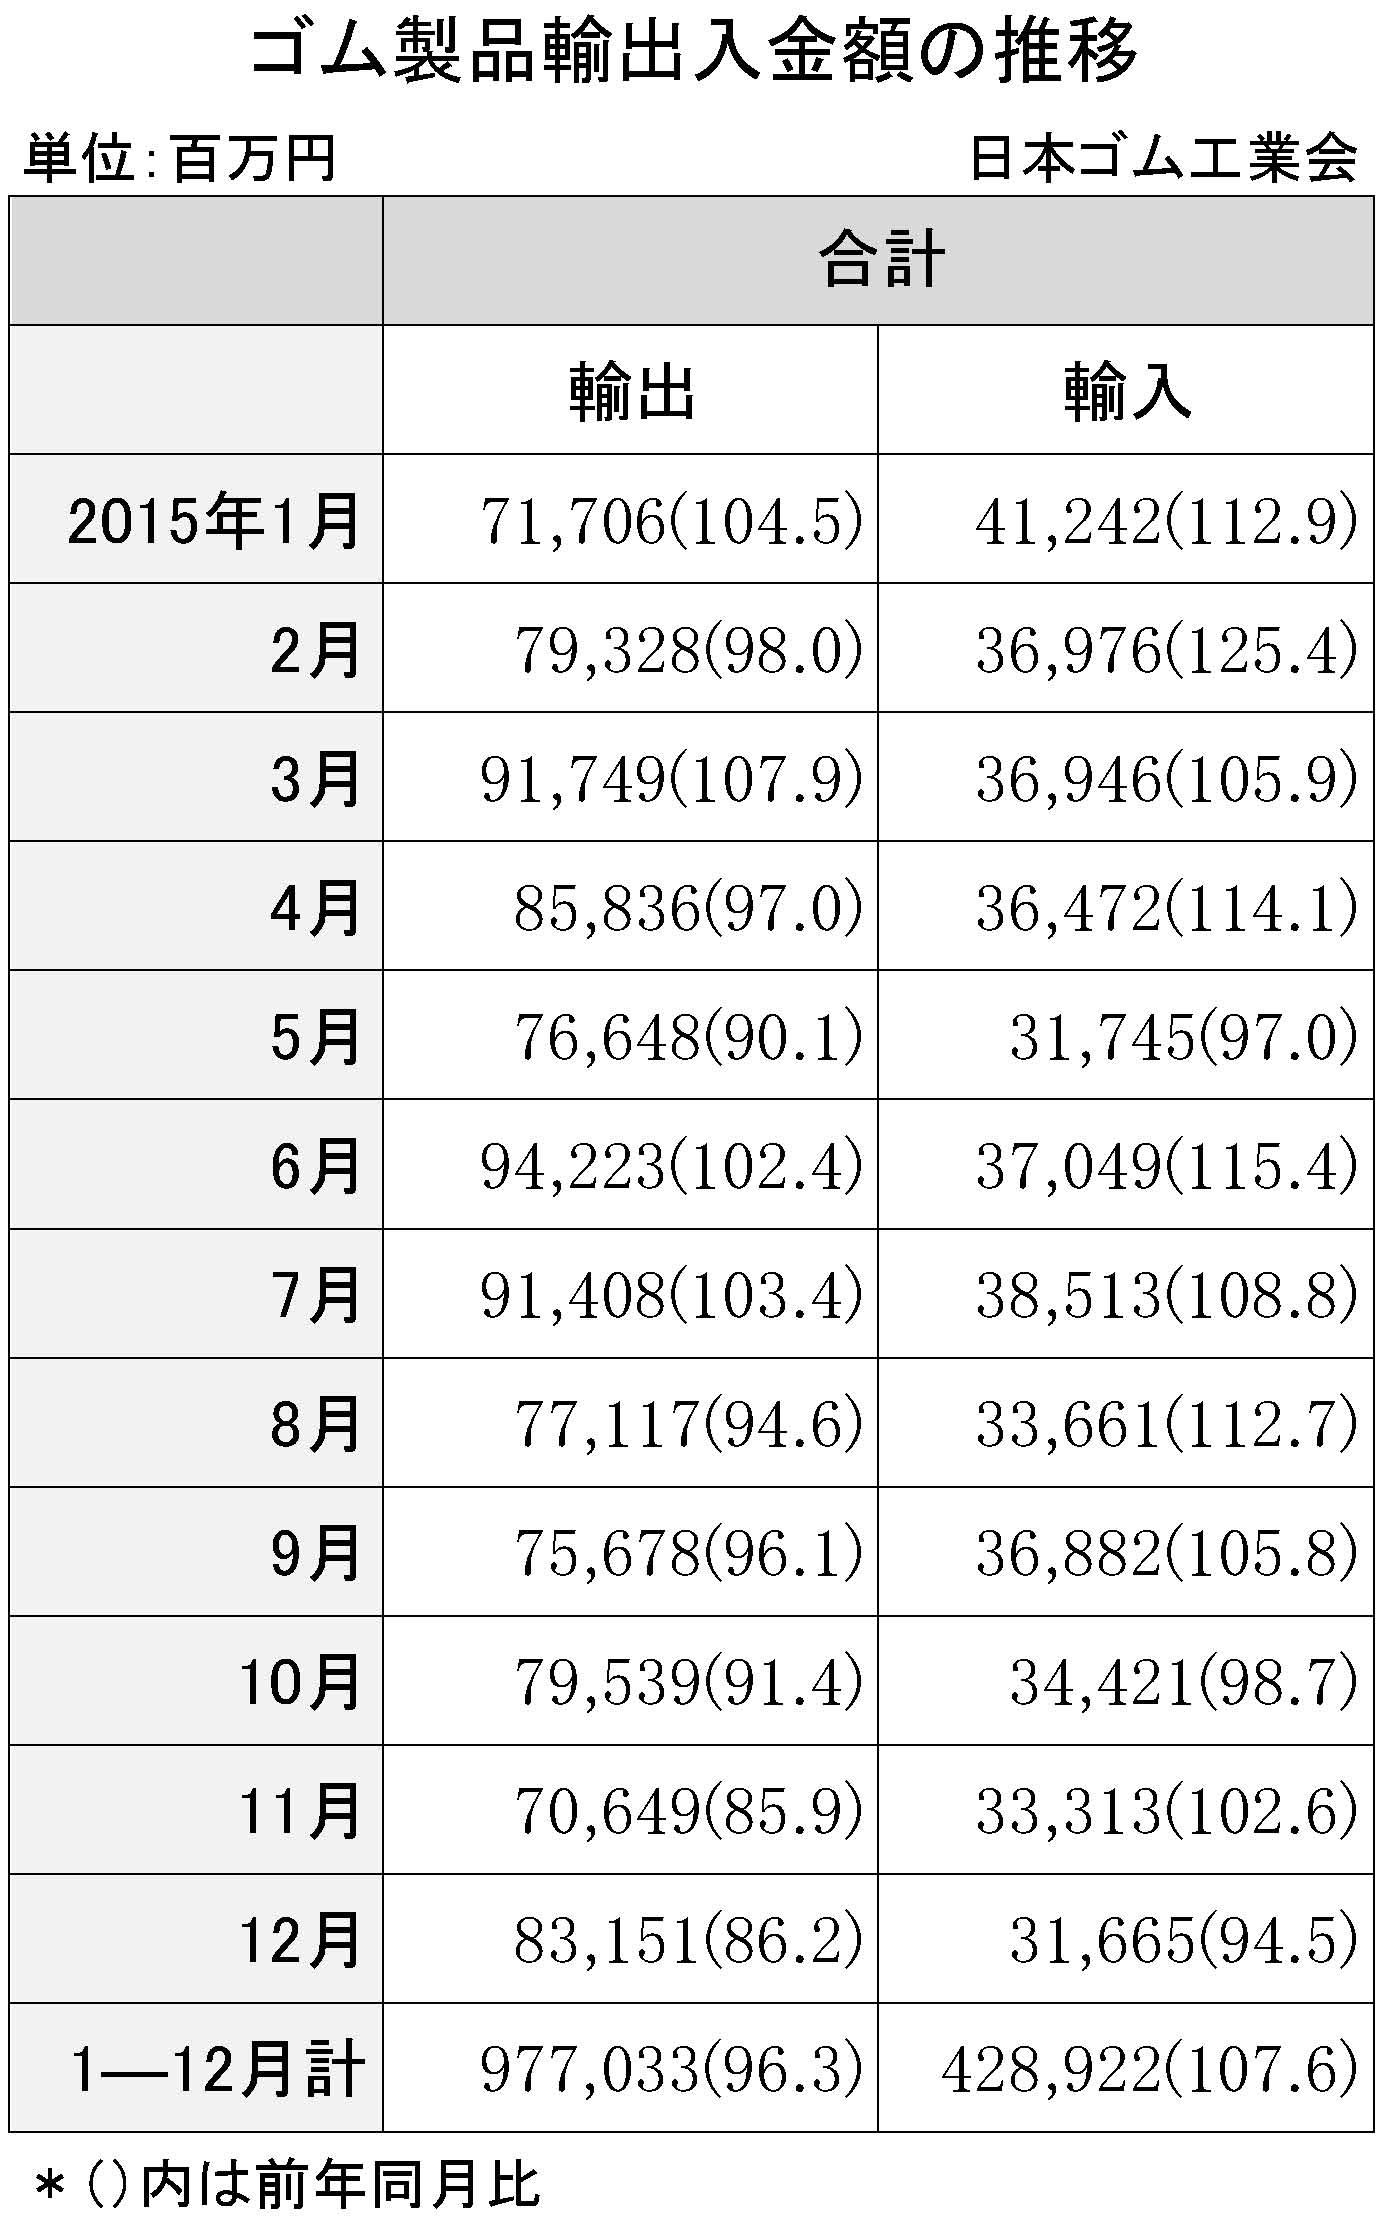 2015年12月ゴム製品輸出入金額